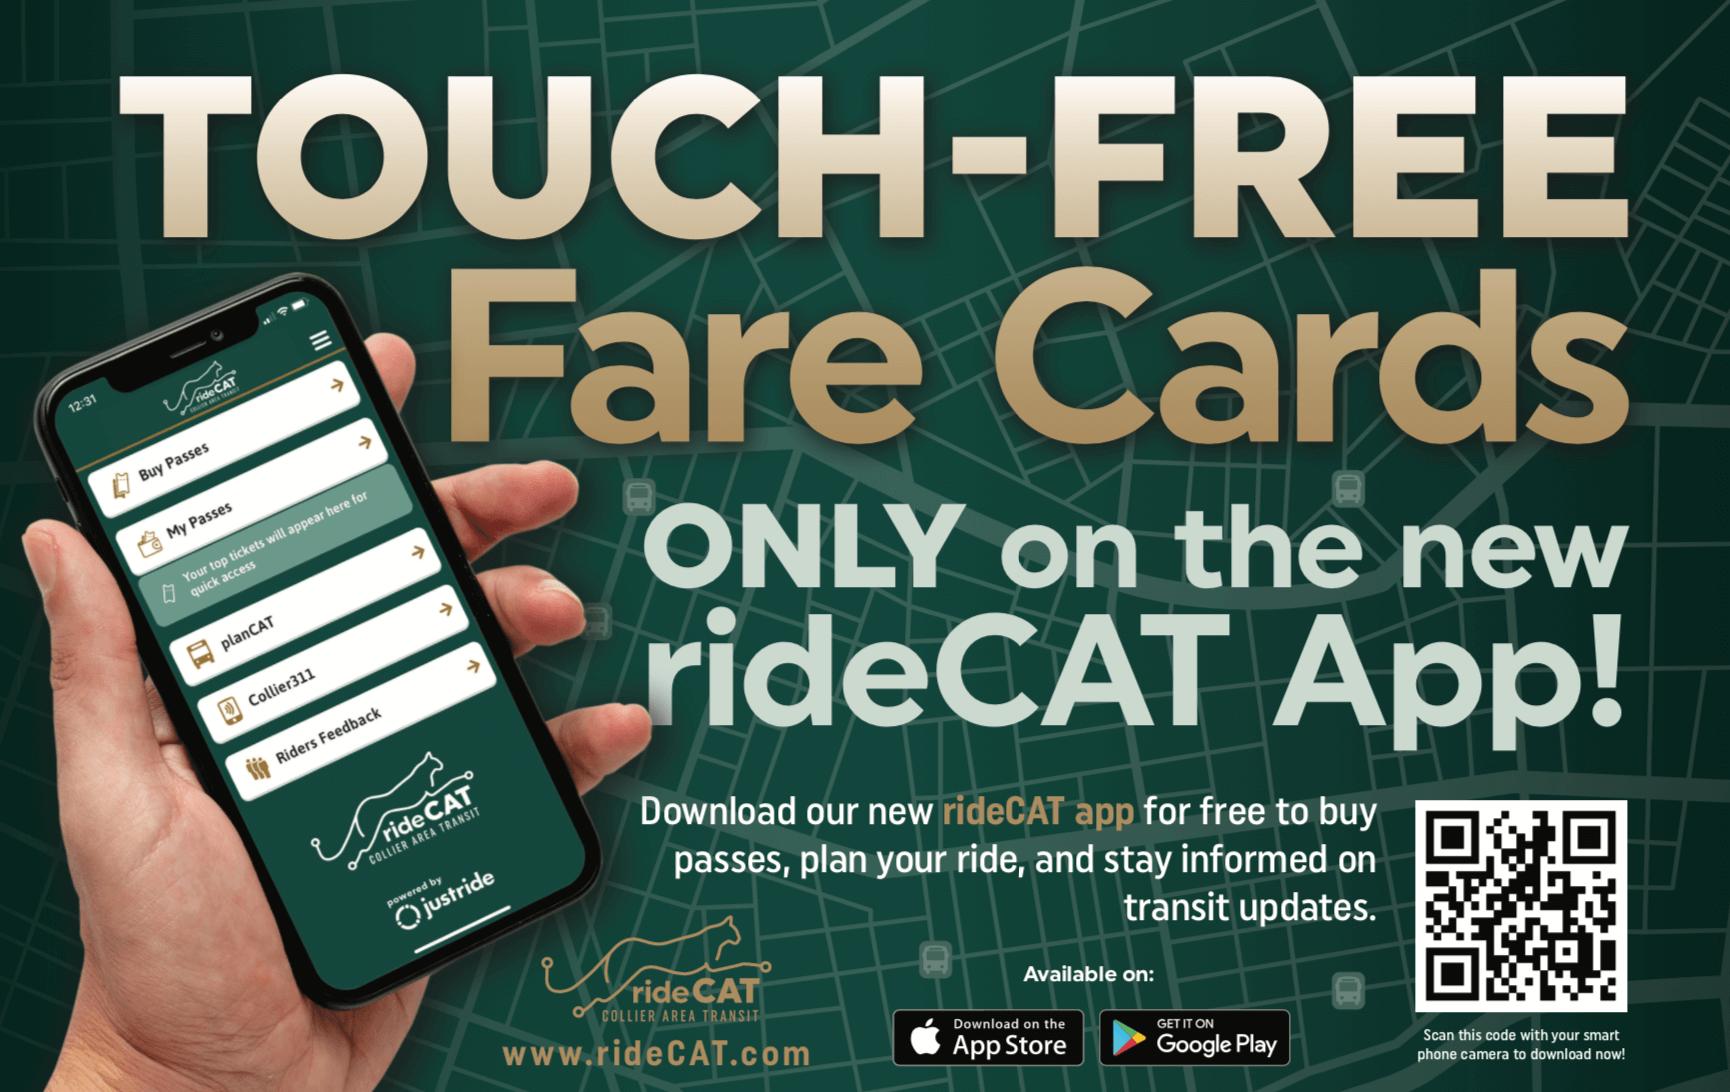 ridecat app